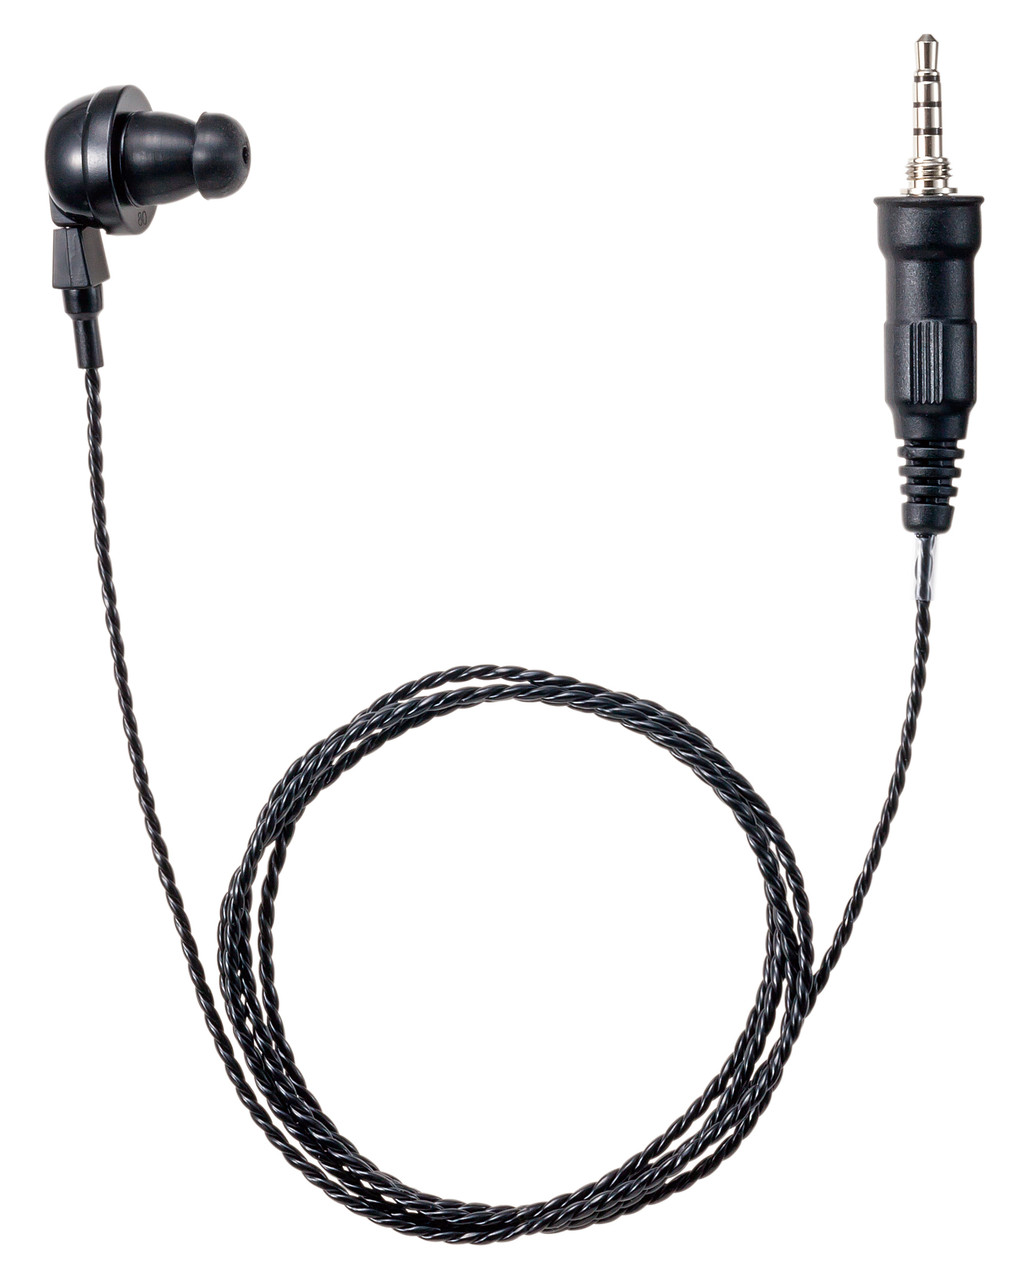 Standard Horizon SEP-10 Earbud for Marine Radios